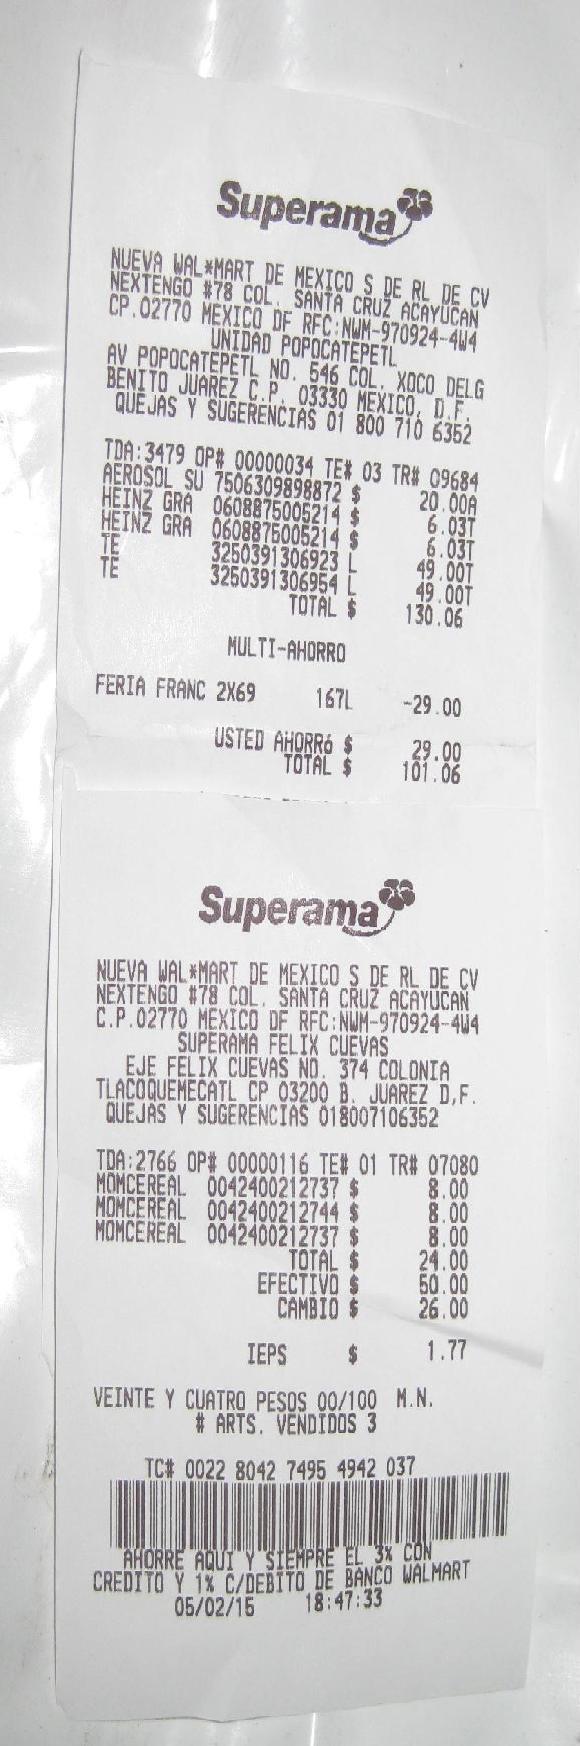 Superama: Cereal a 8 pesos